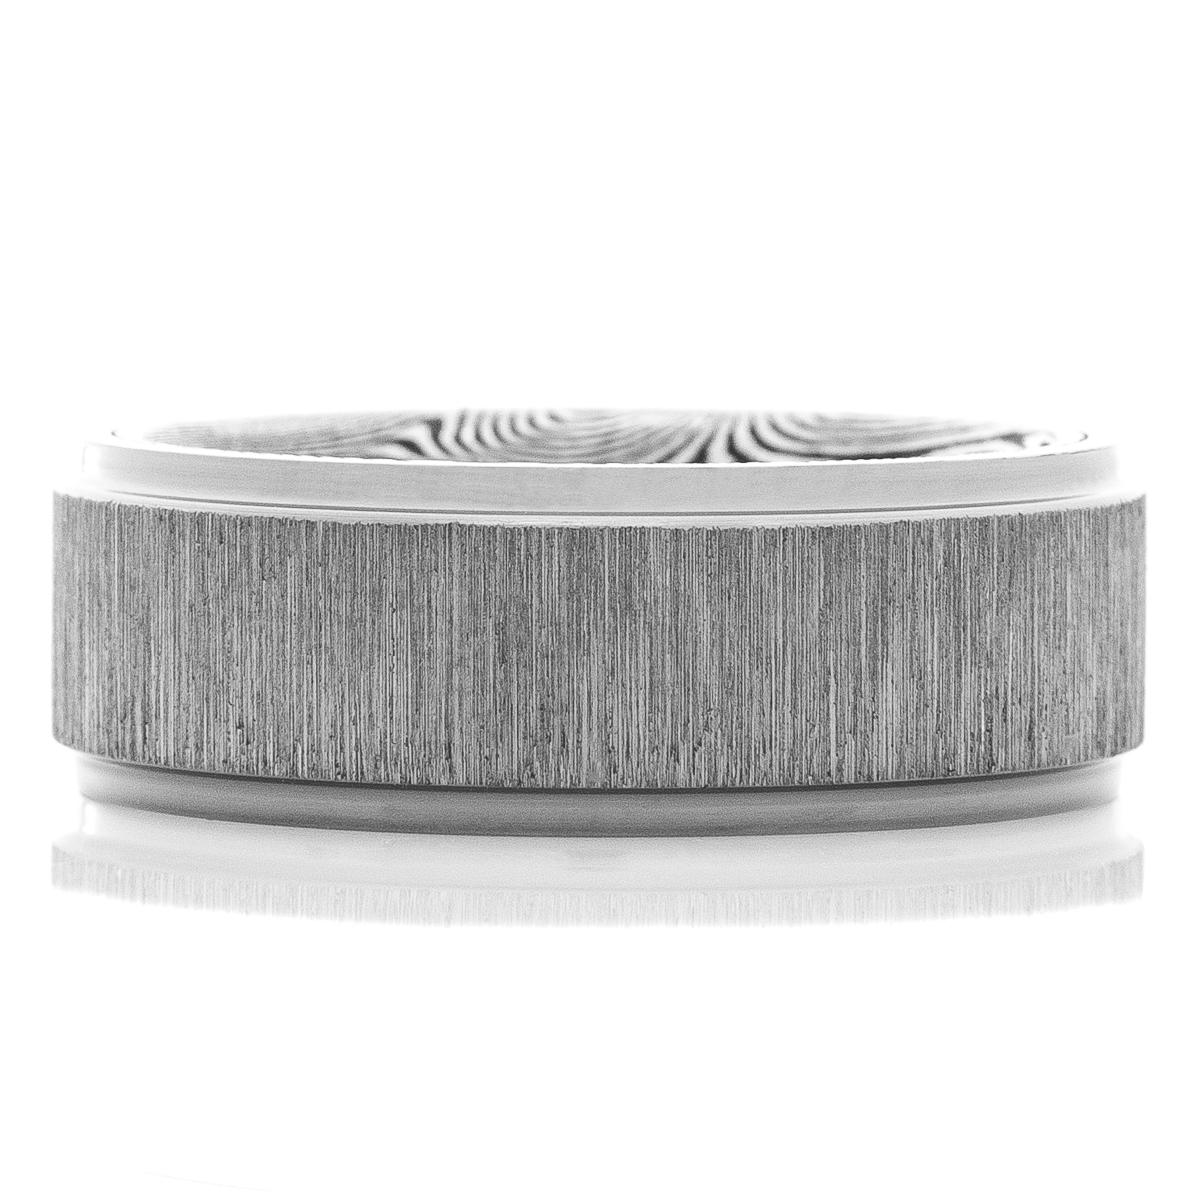 Men's Cross Satin Tantalum Ring with Designed Sleeve